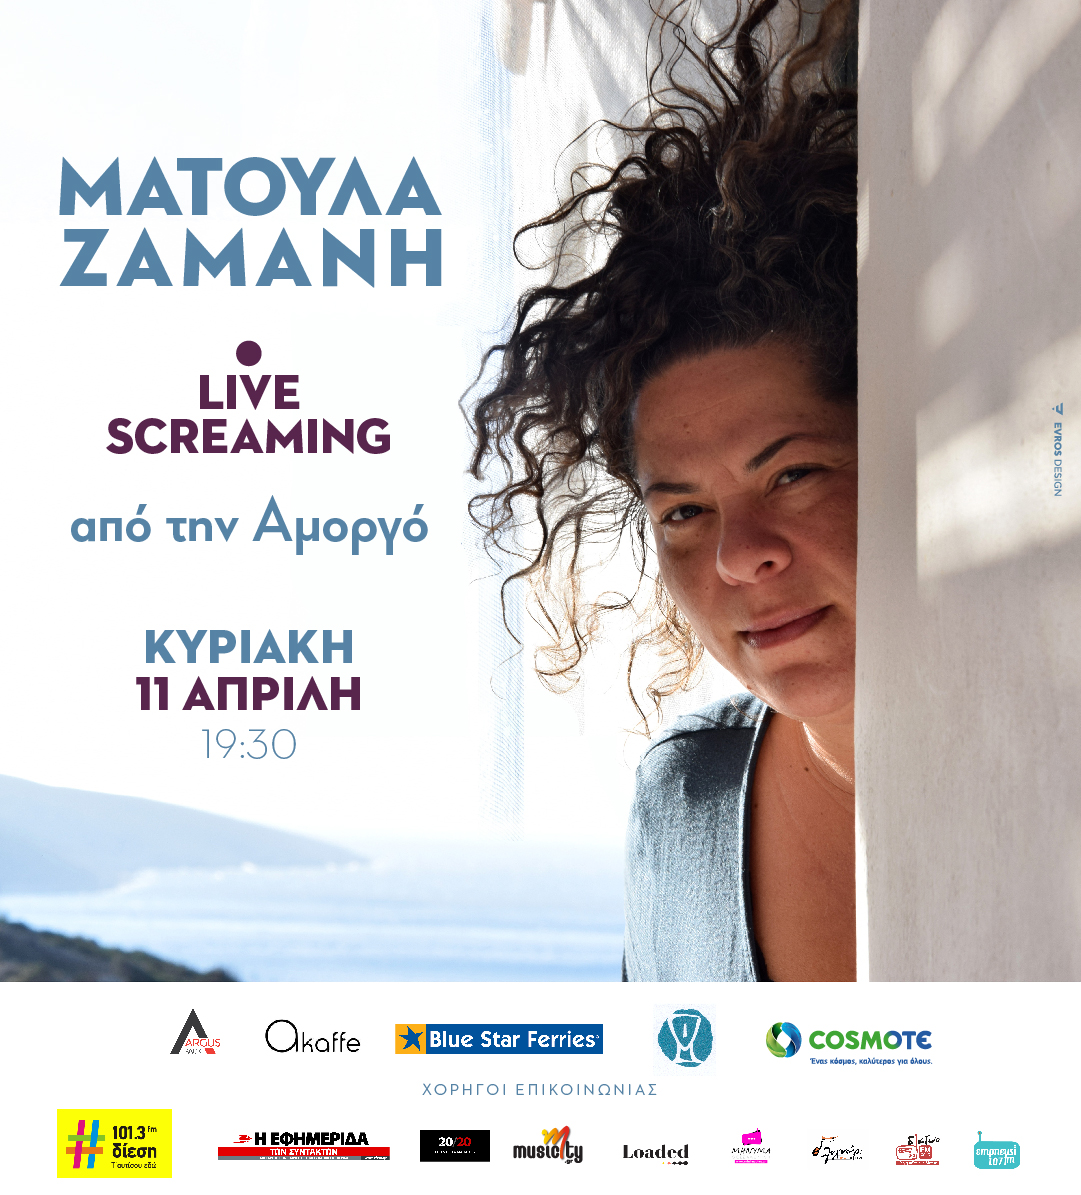 H Ματούλα Ζαμάνη σε Live Streaming συναυλία από την Αμοργό